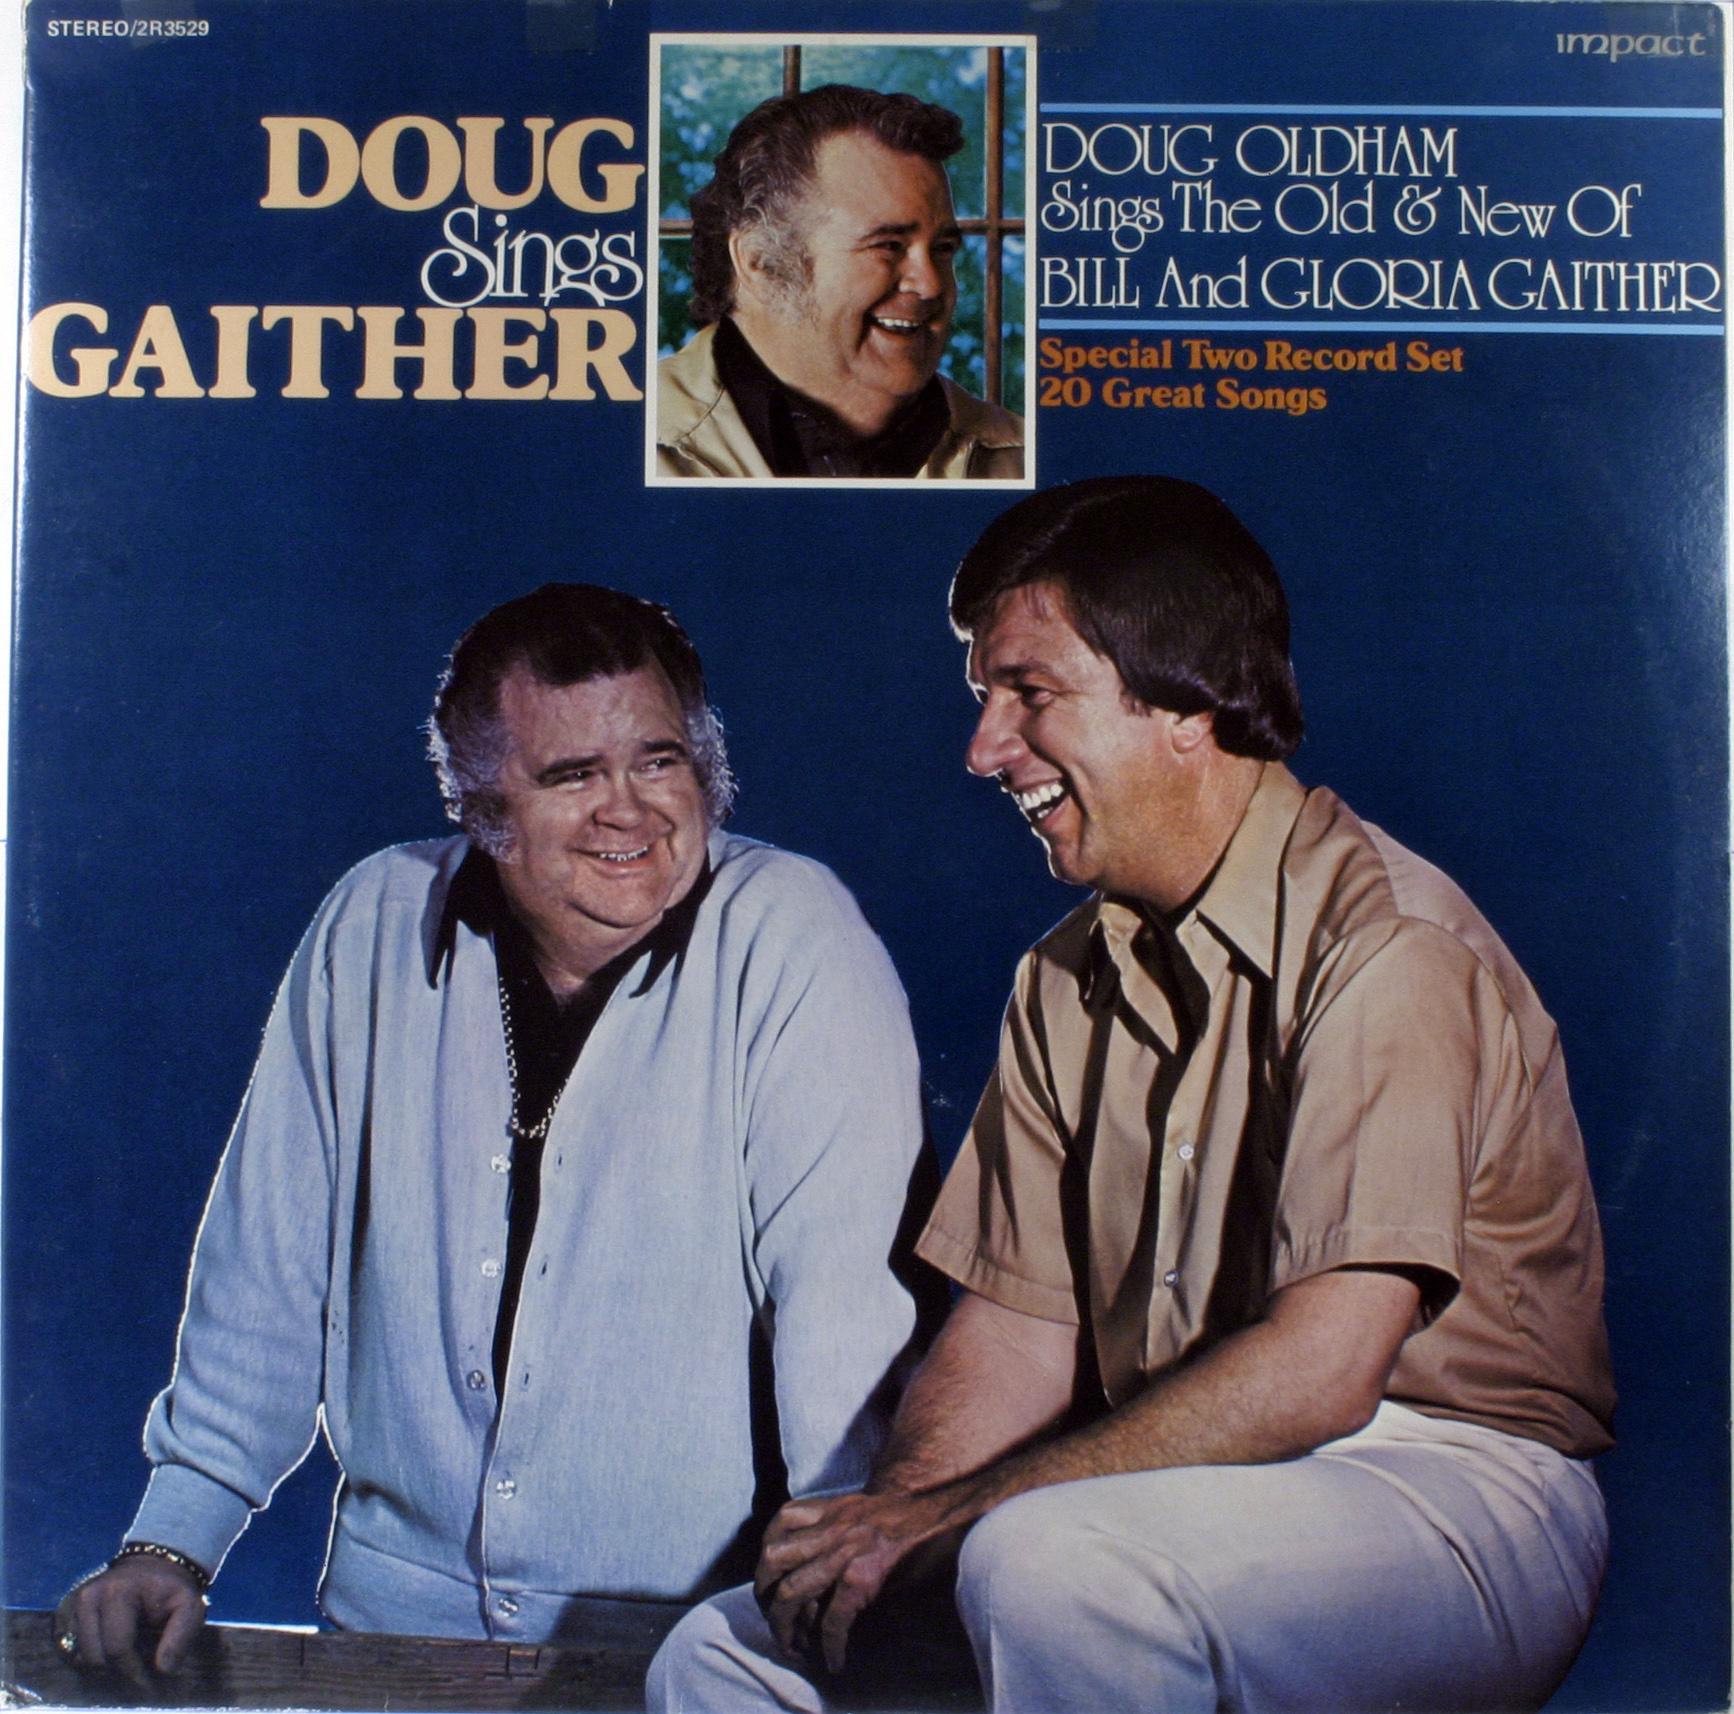 Doug Sings Gaither